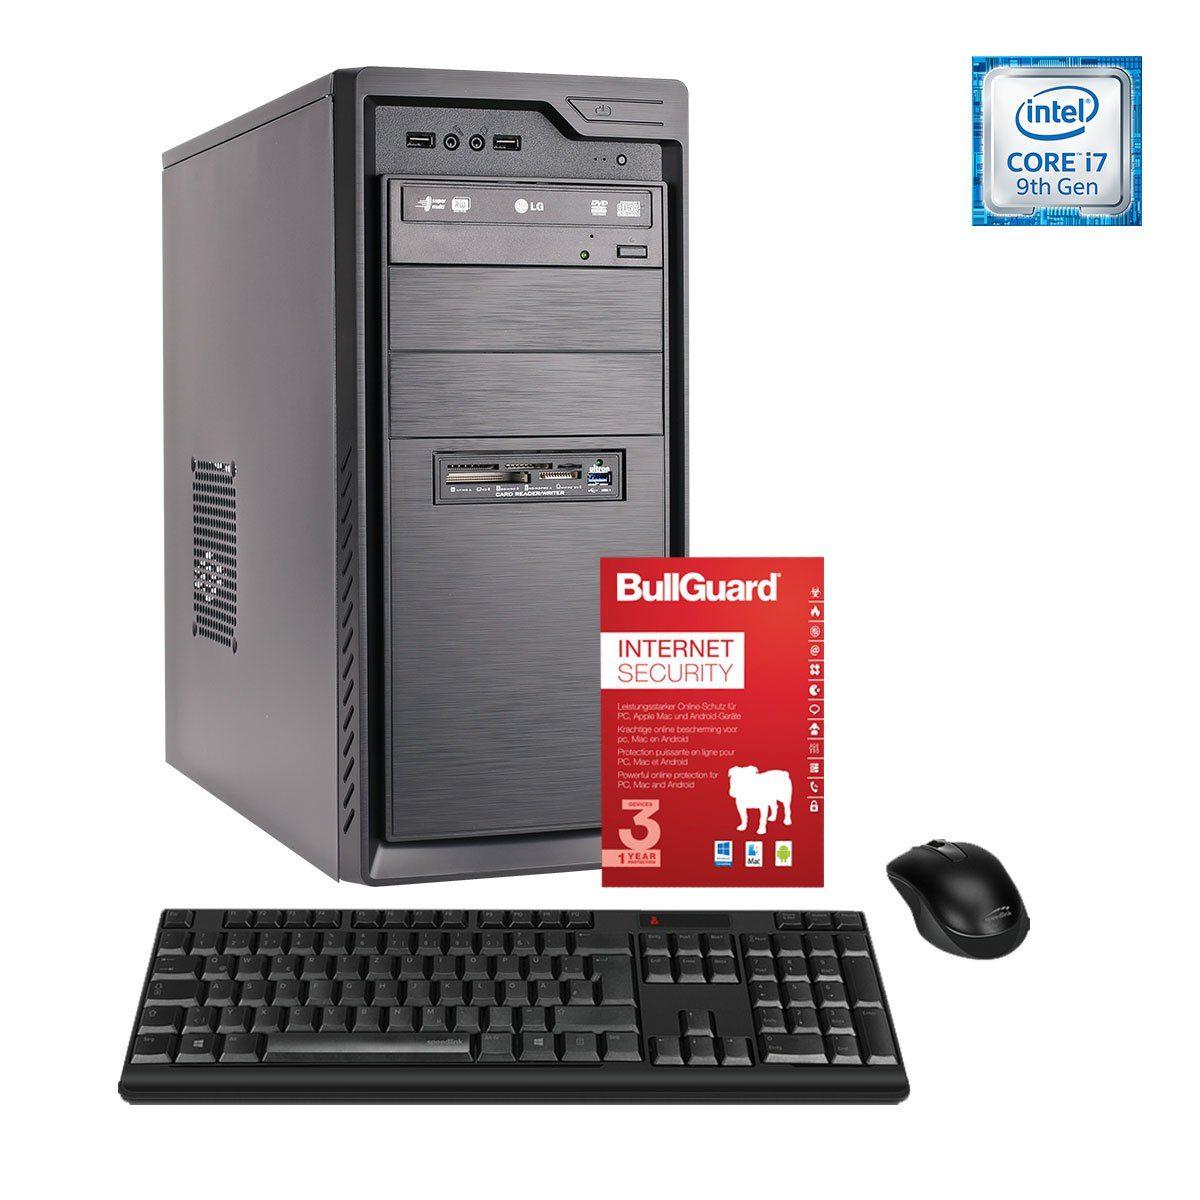 ONE PC, Core i7-9700K, UHD Graphics 630, 8GB »Office PC 130369«